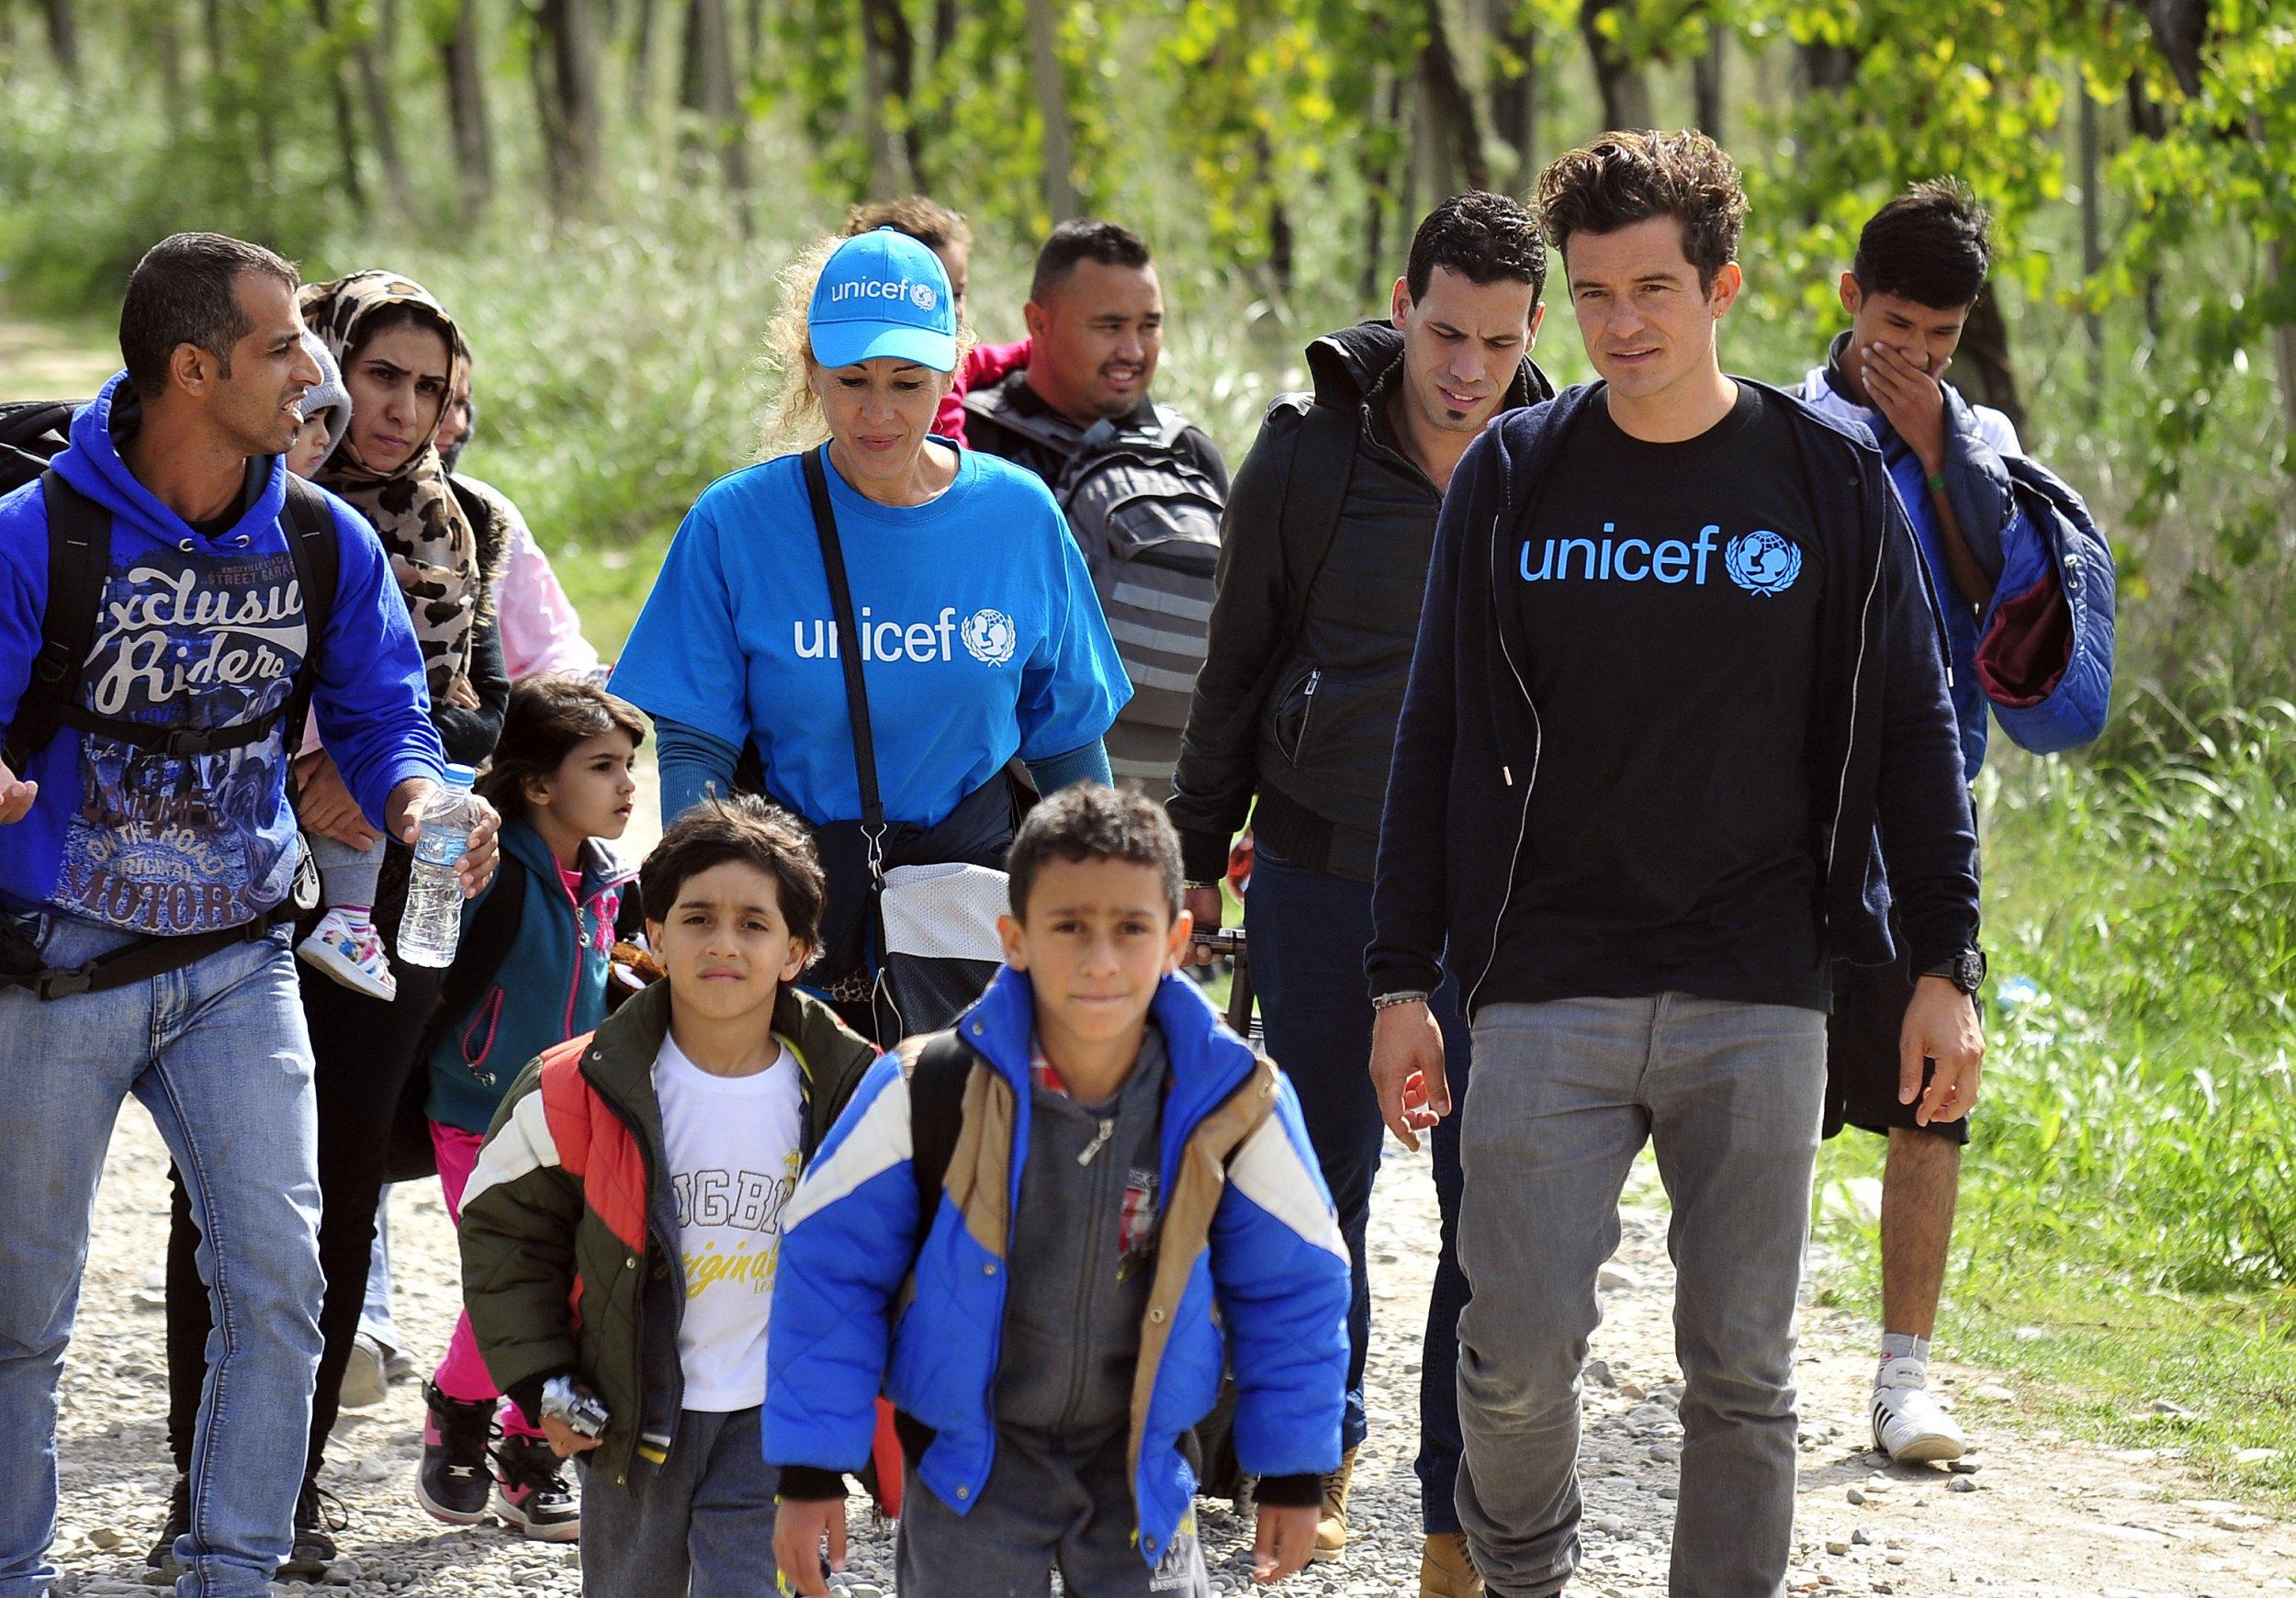 UNICEF-NYHQ2015-2526-Georgiev